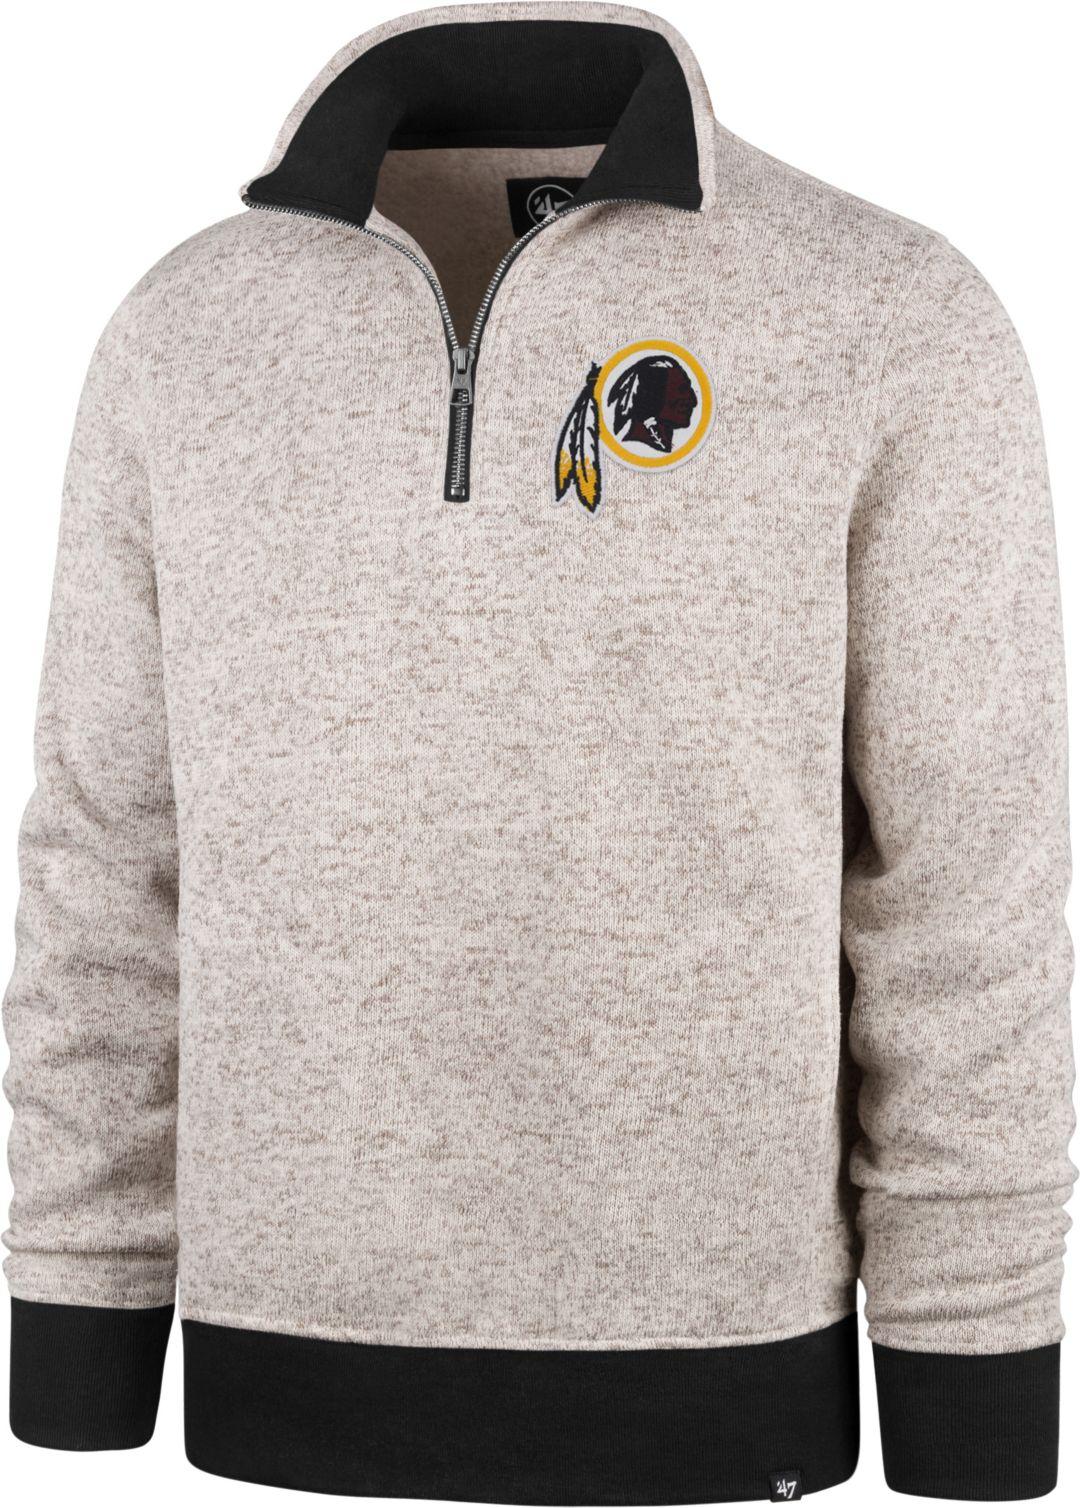 competitive price 7c29d f6010 '47 Men's Washington Redskins Oatmeal Kodiak Quarter-Zip